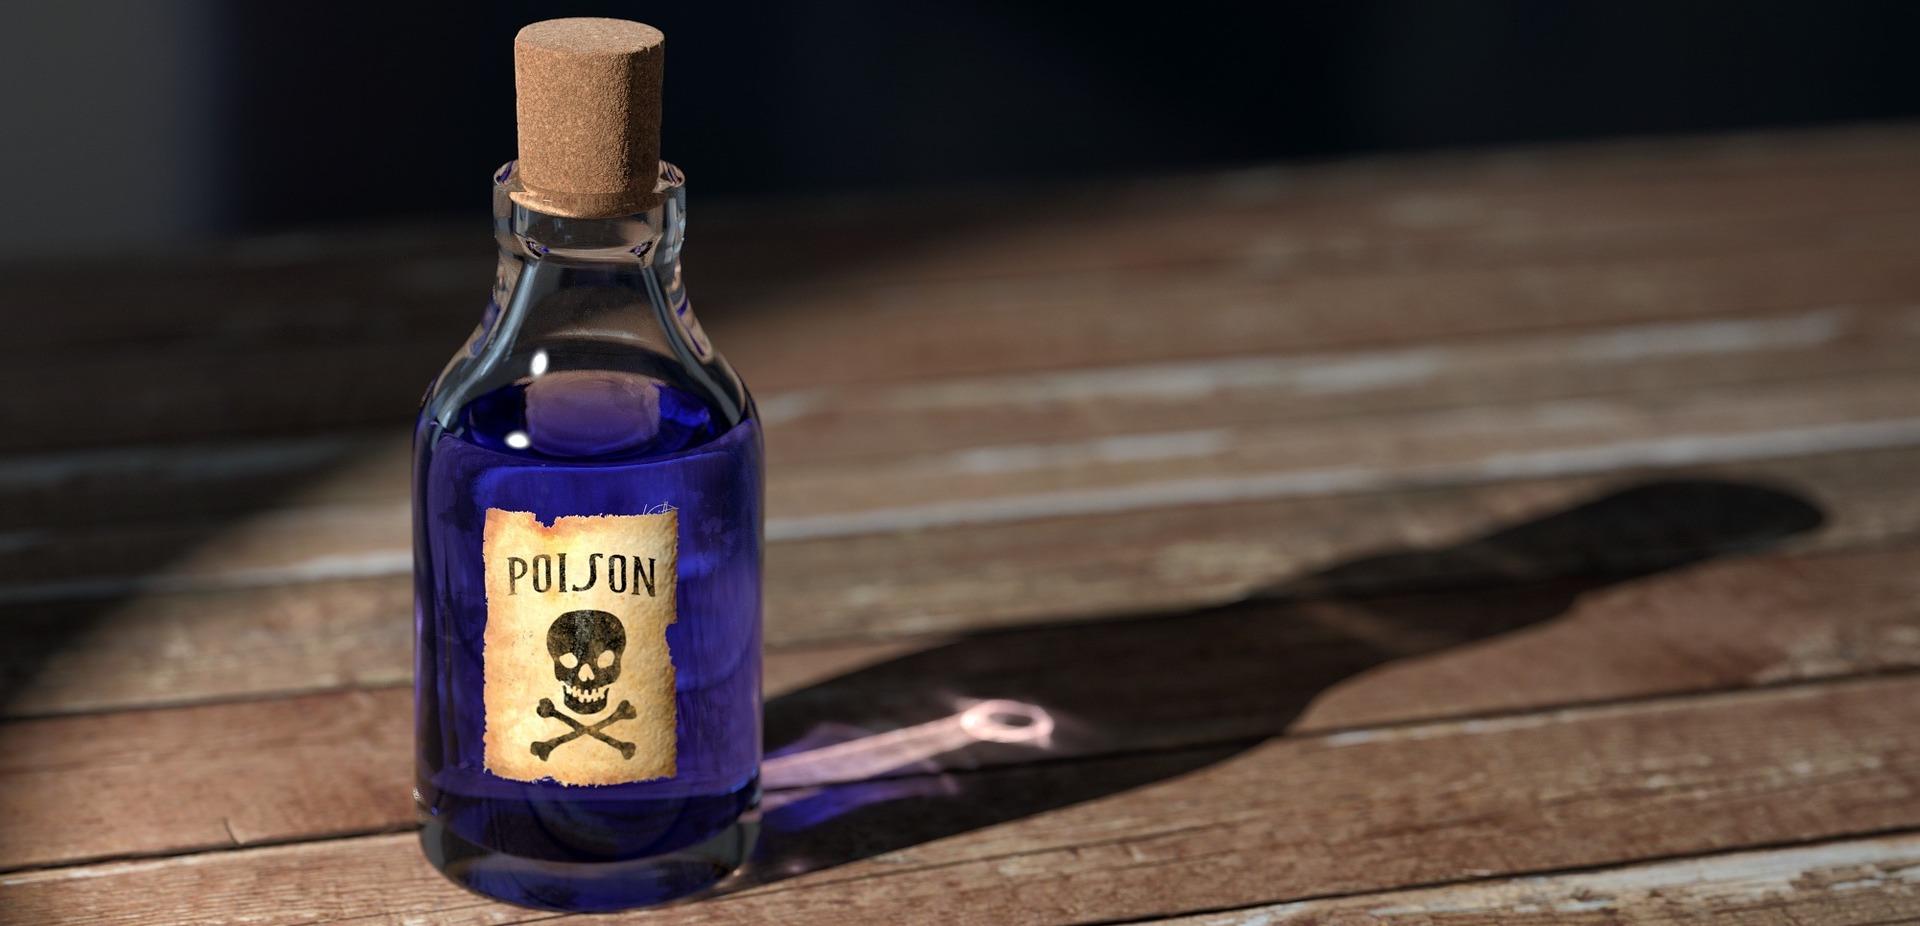 poison-1481596_1920 pixabay Arek Socha copy